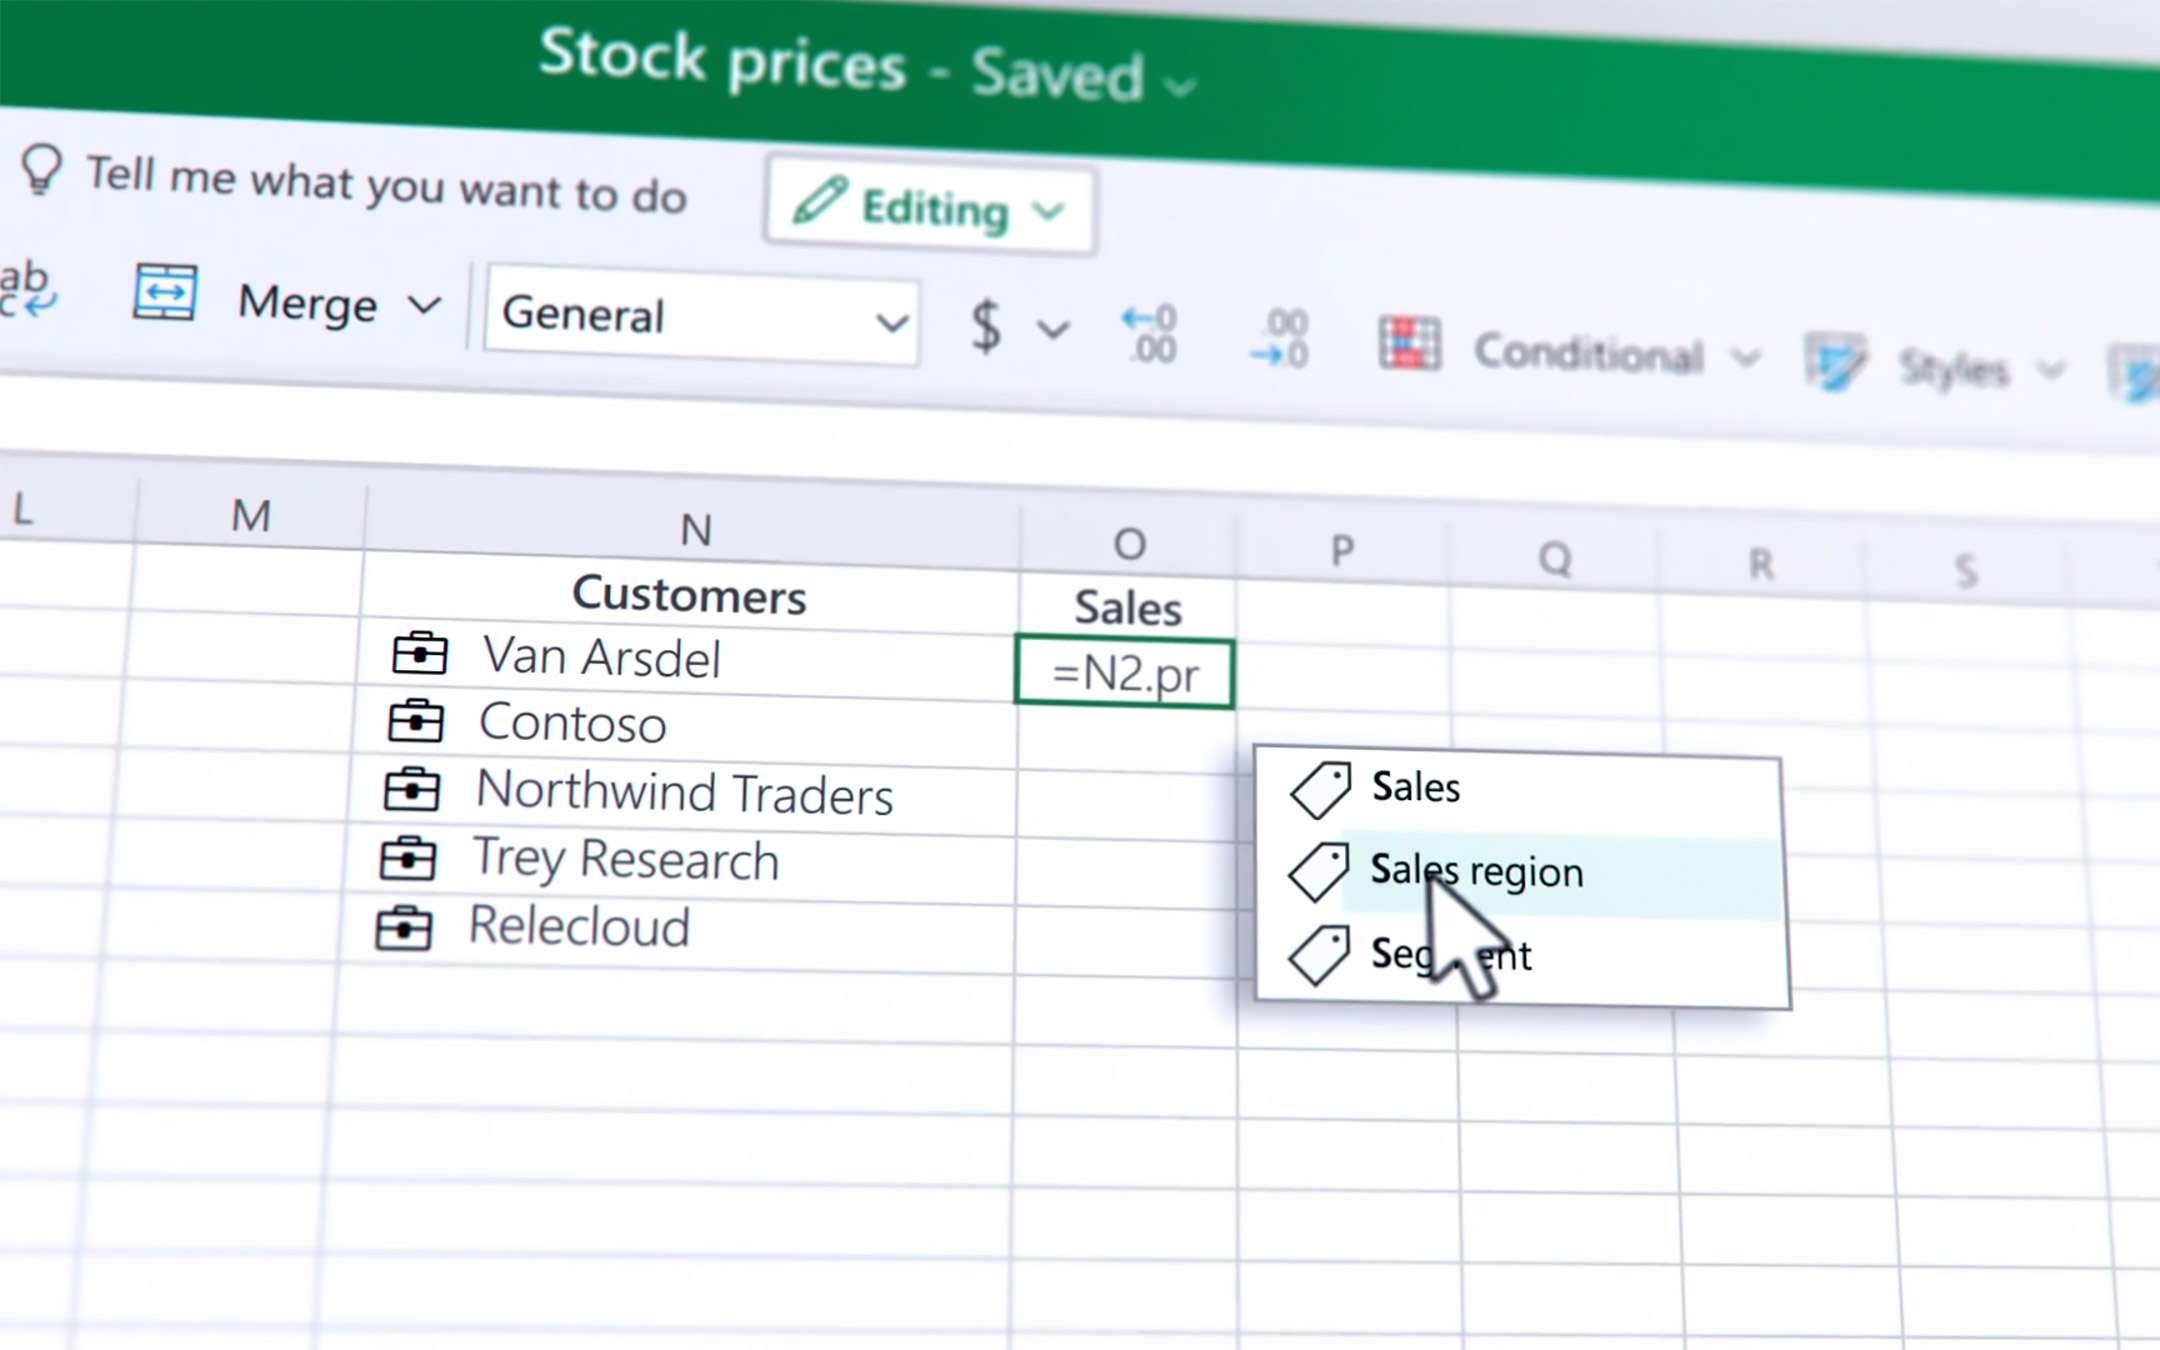 Microsoft improves data management in Excel